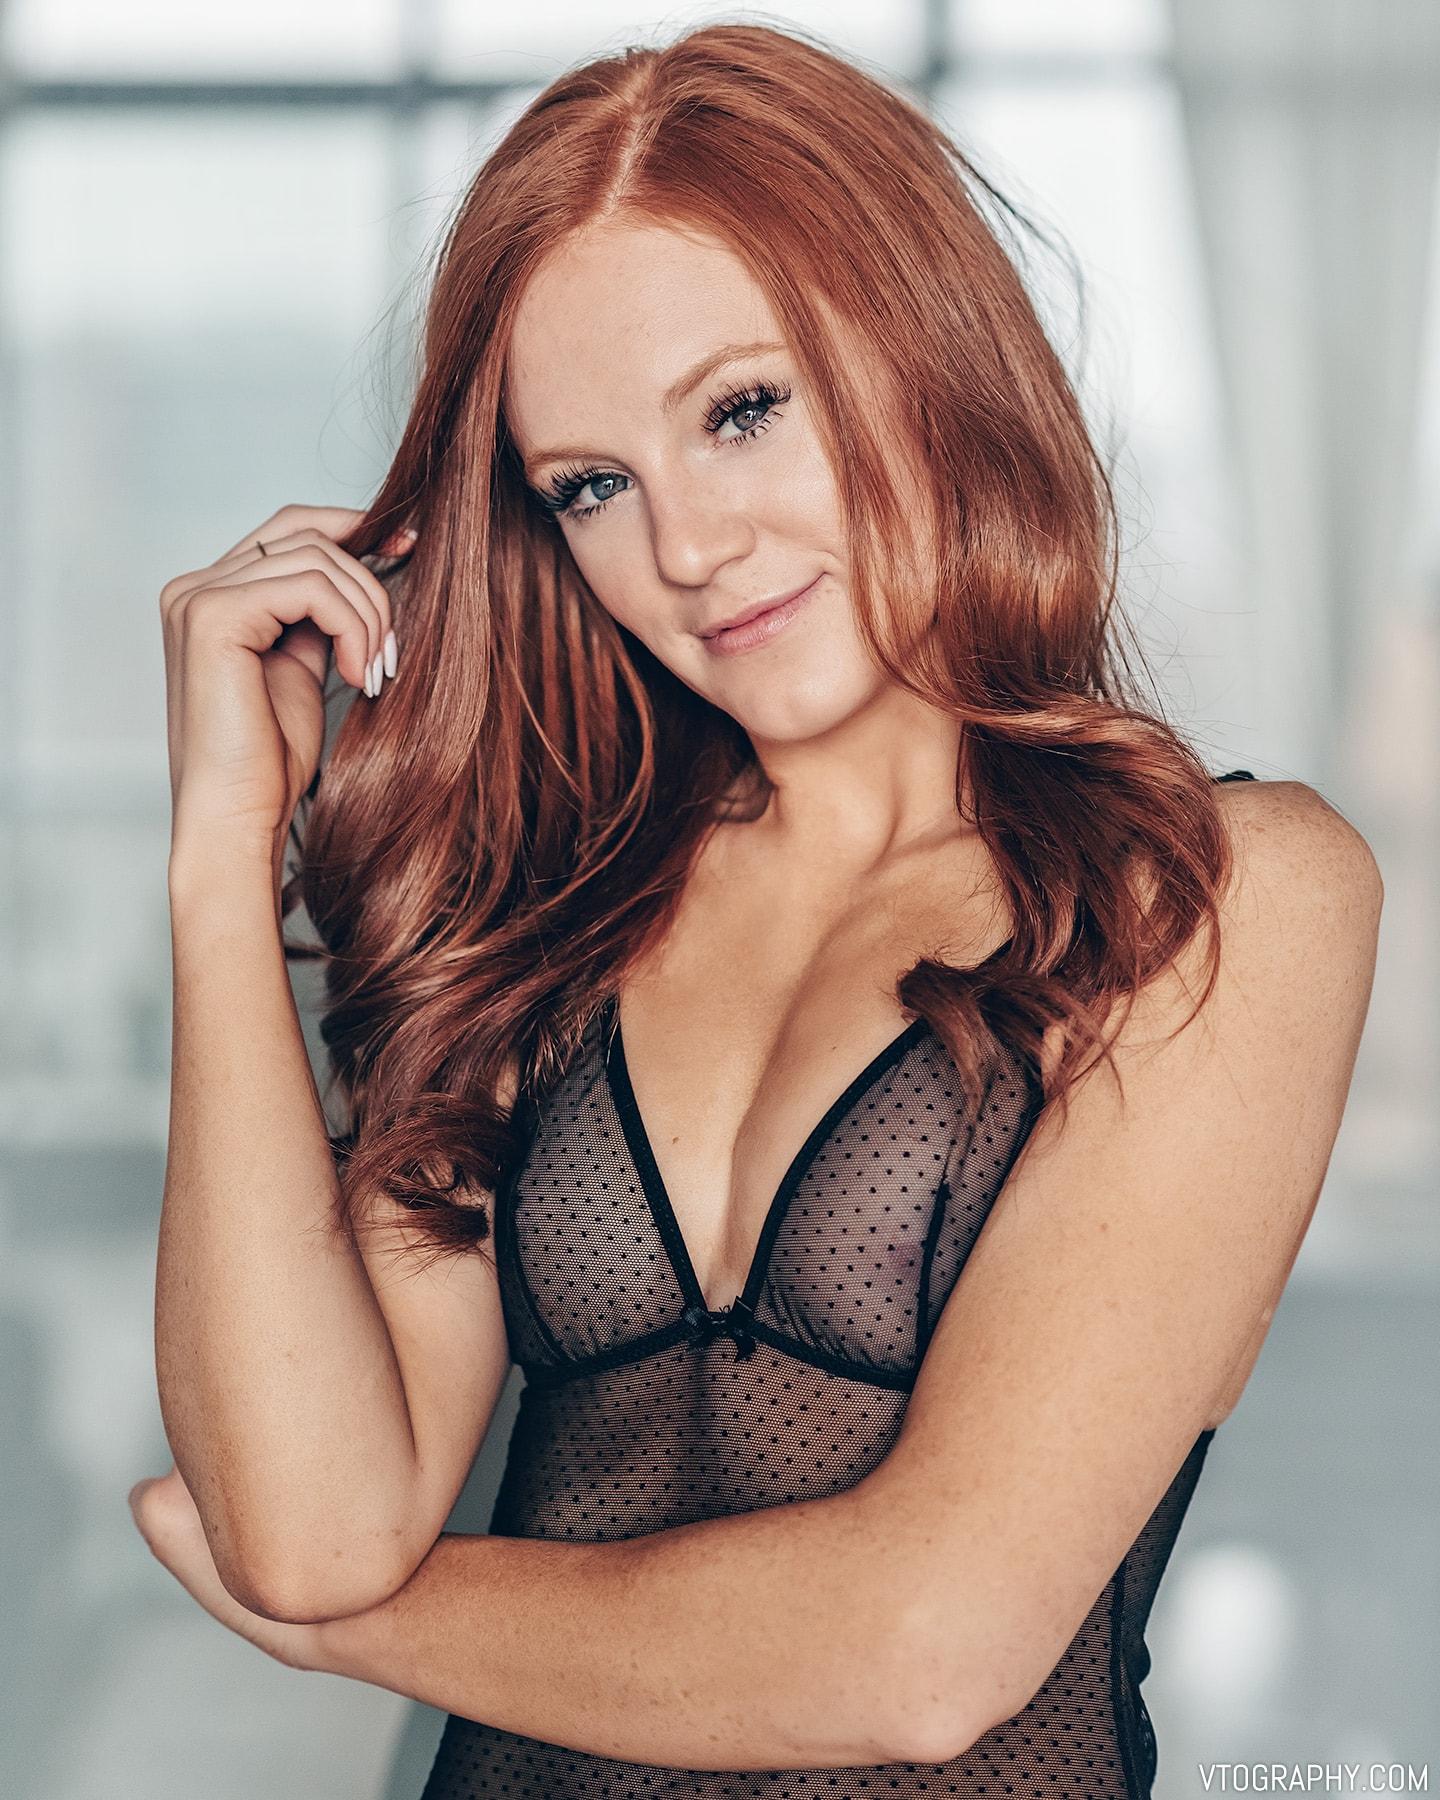 Redhead model Hannah in La Vie En Rose lingerie